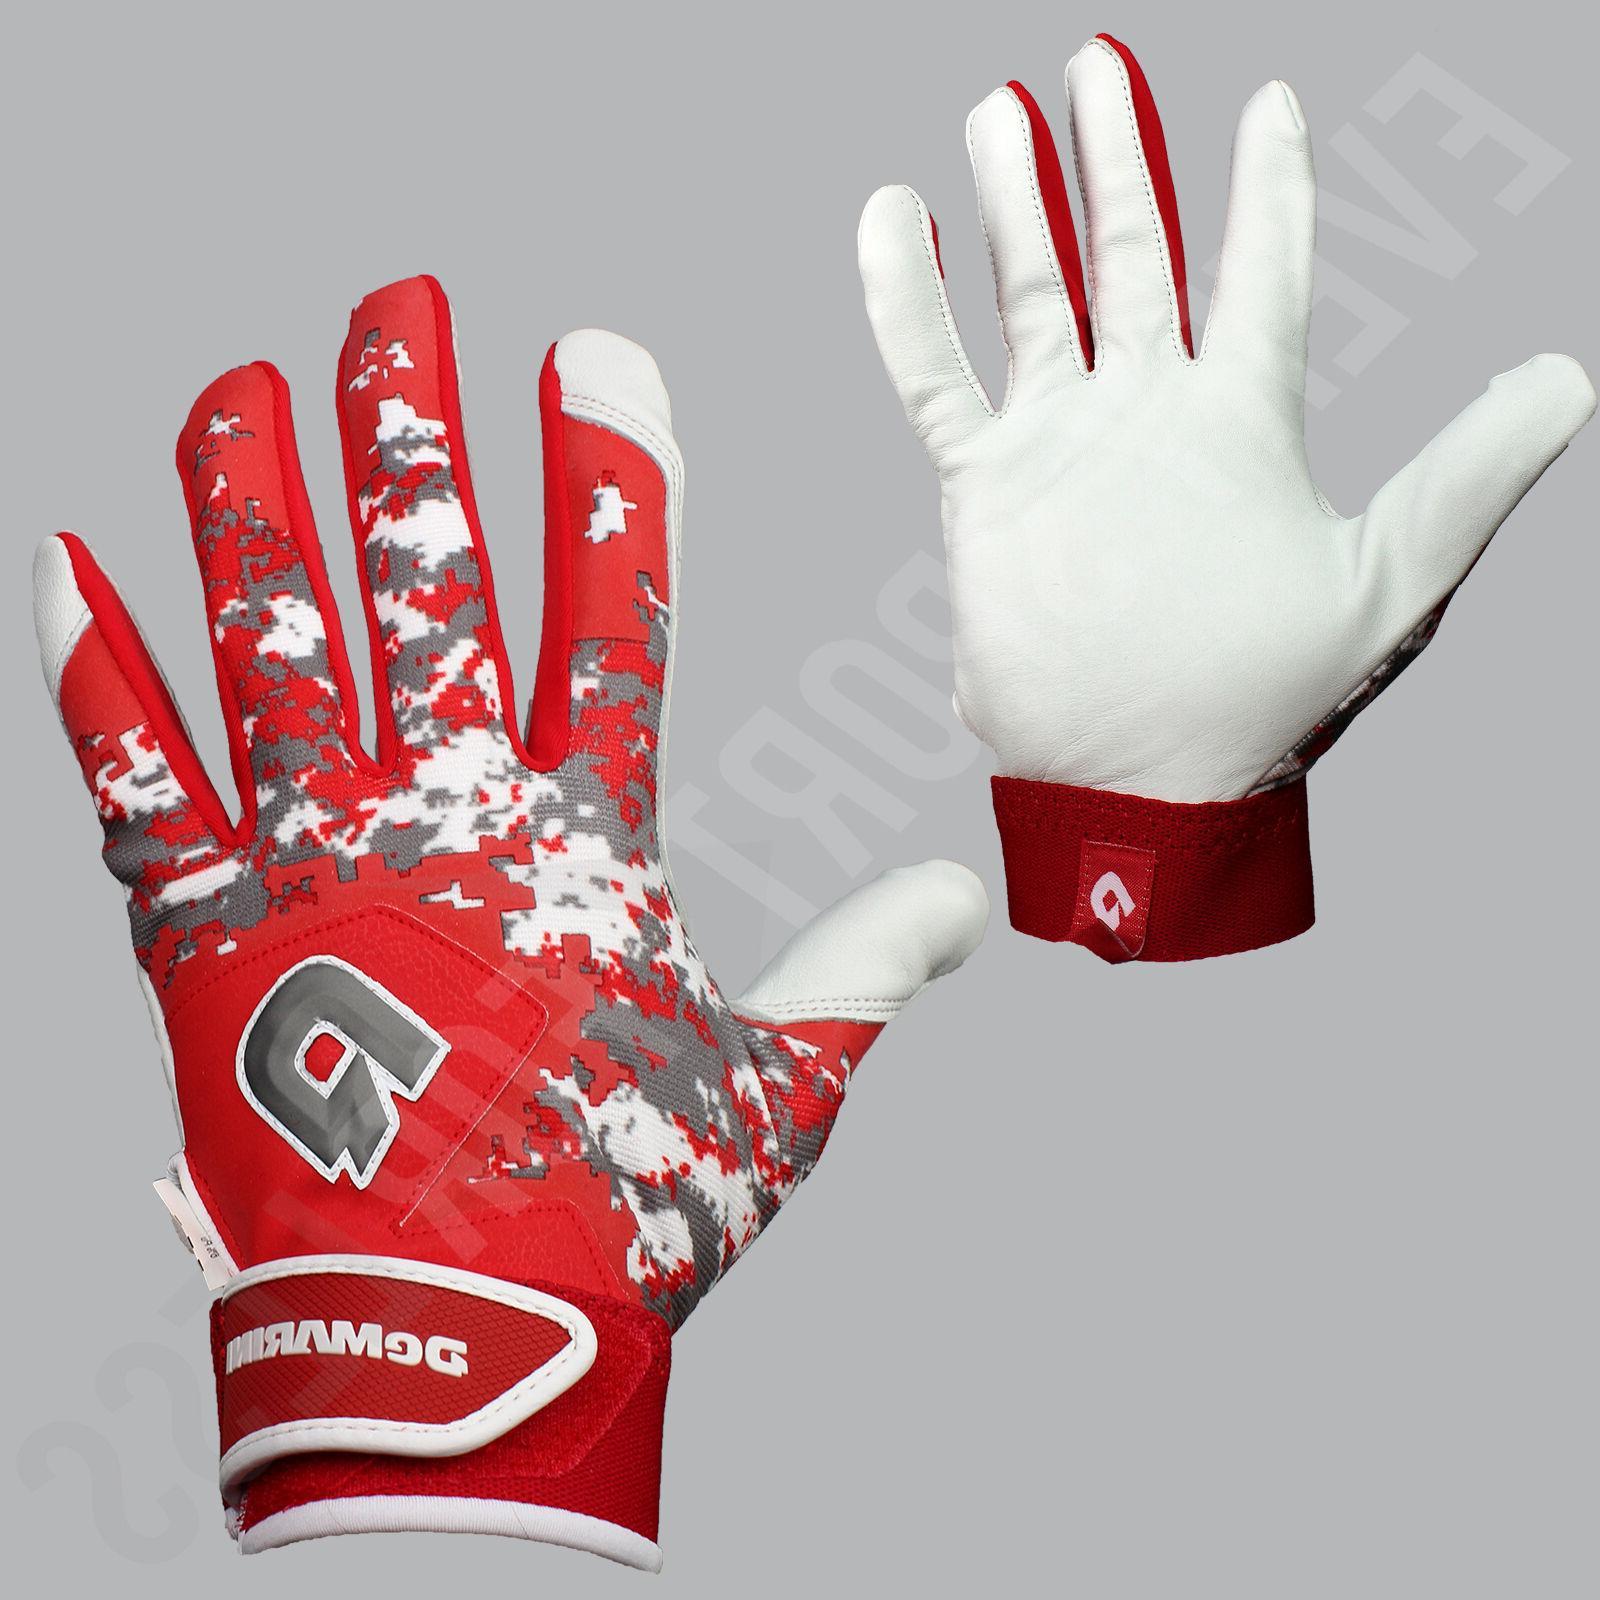 new digi ii camo baseball batting gloves